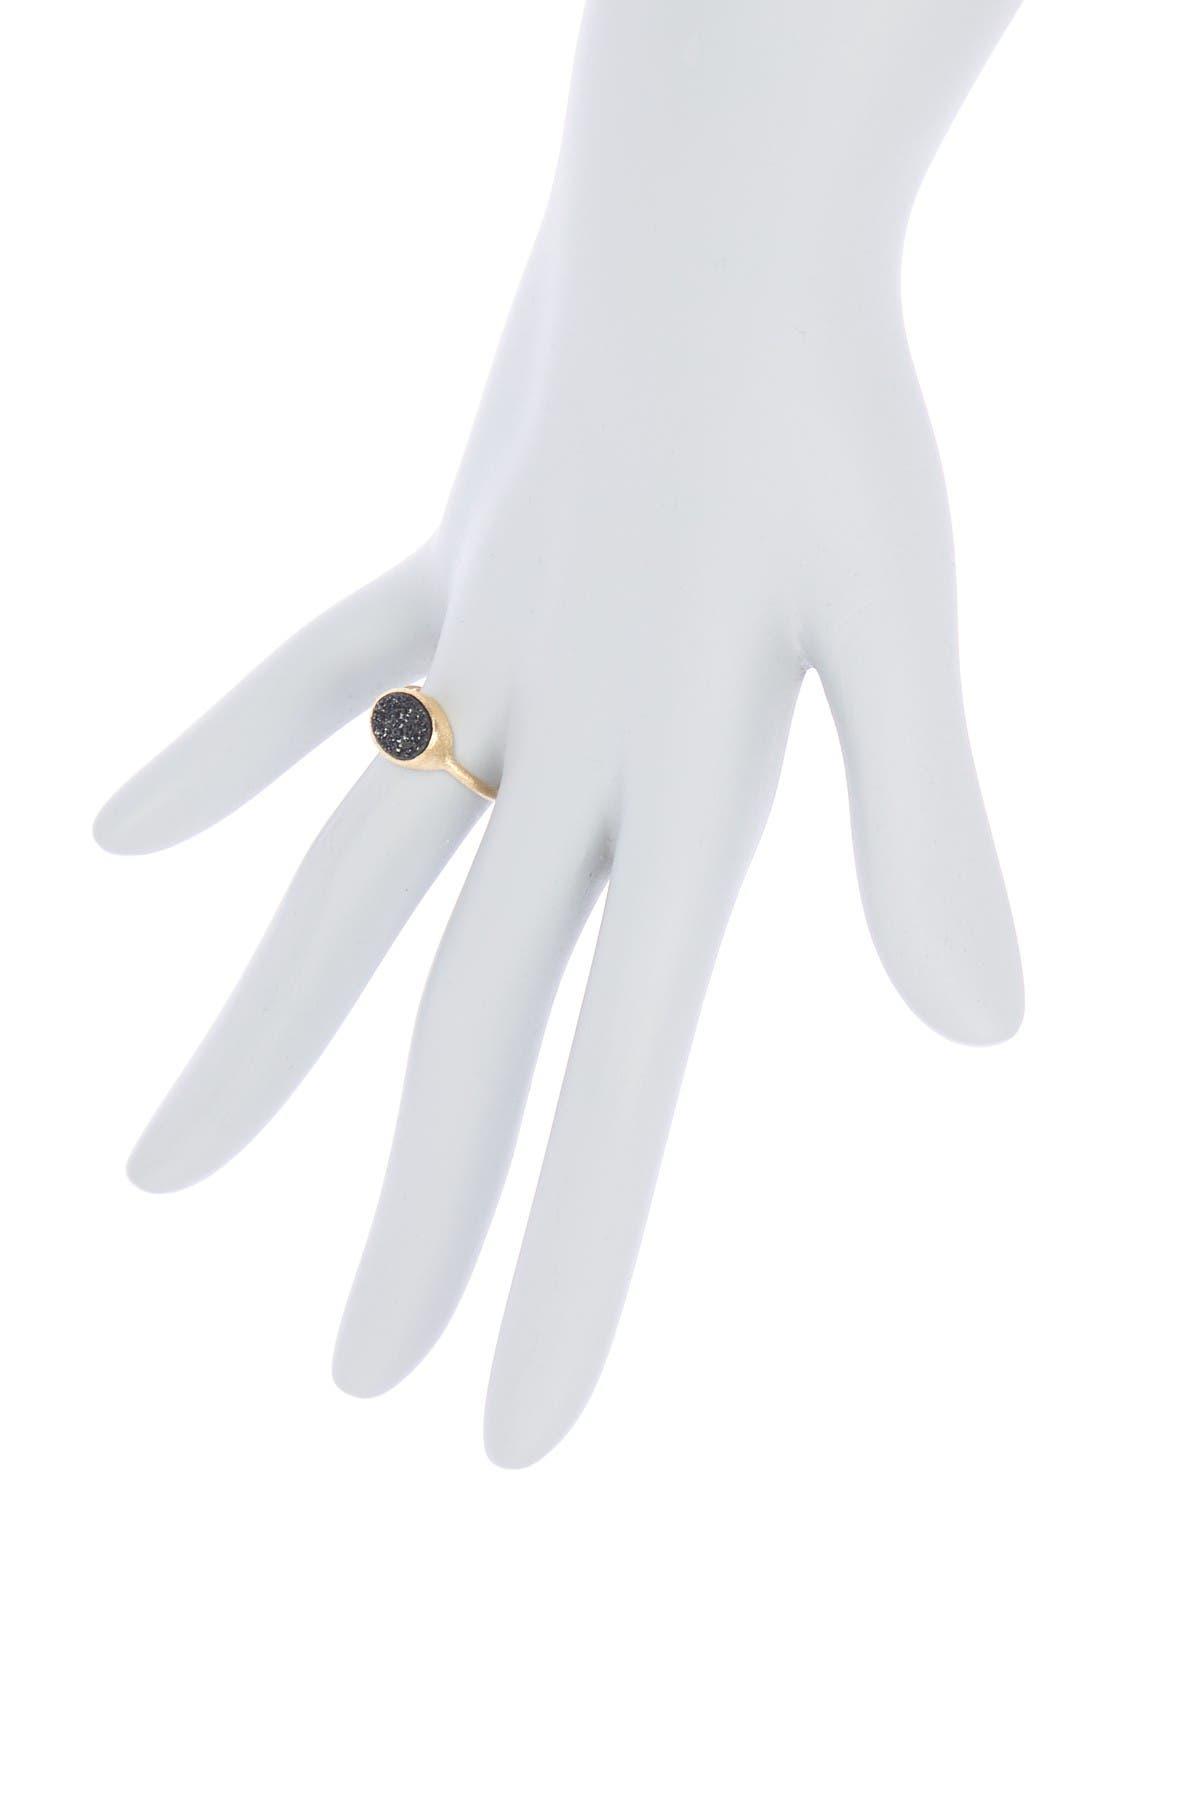 Image of Rivka Friedman 18K Gold Clad Petite East/West Black Druzy Ring